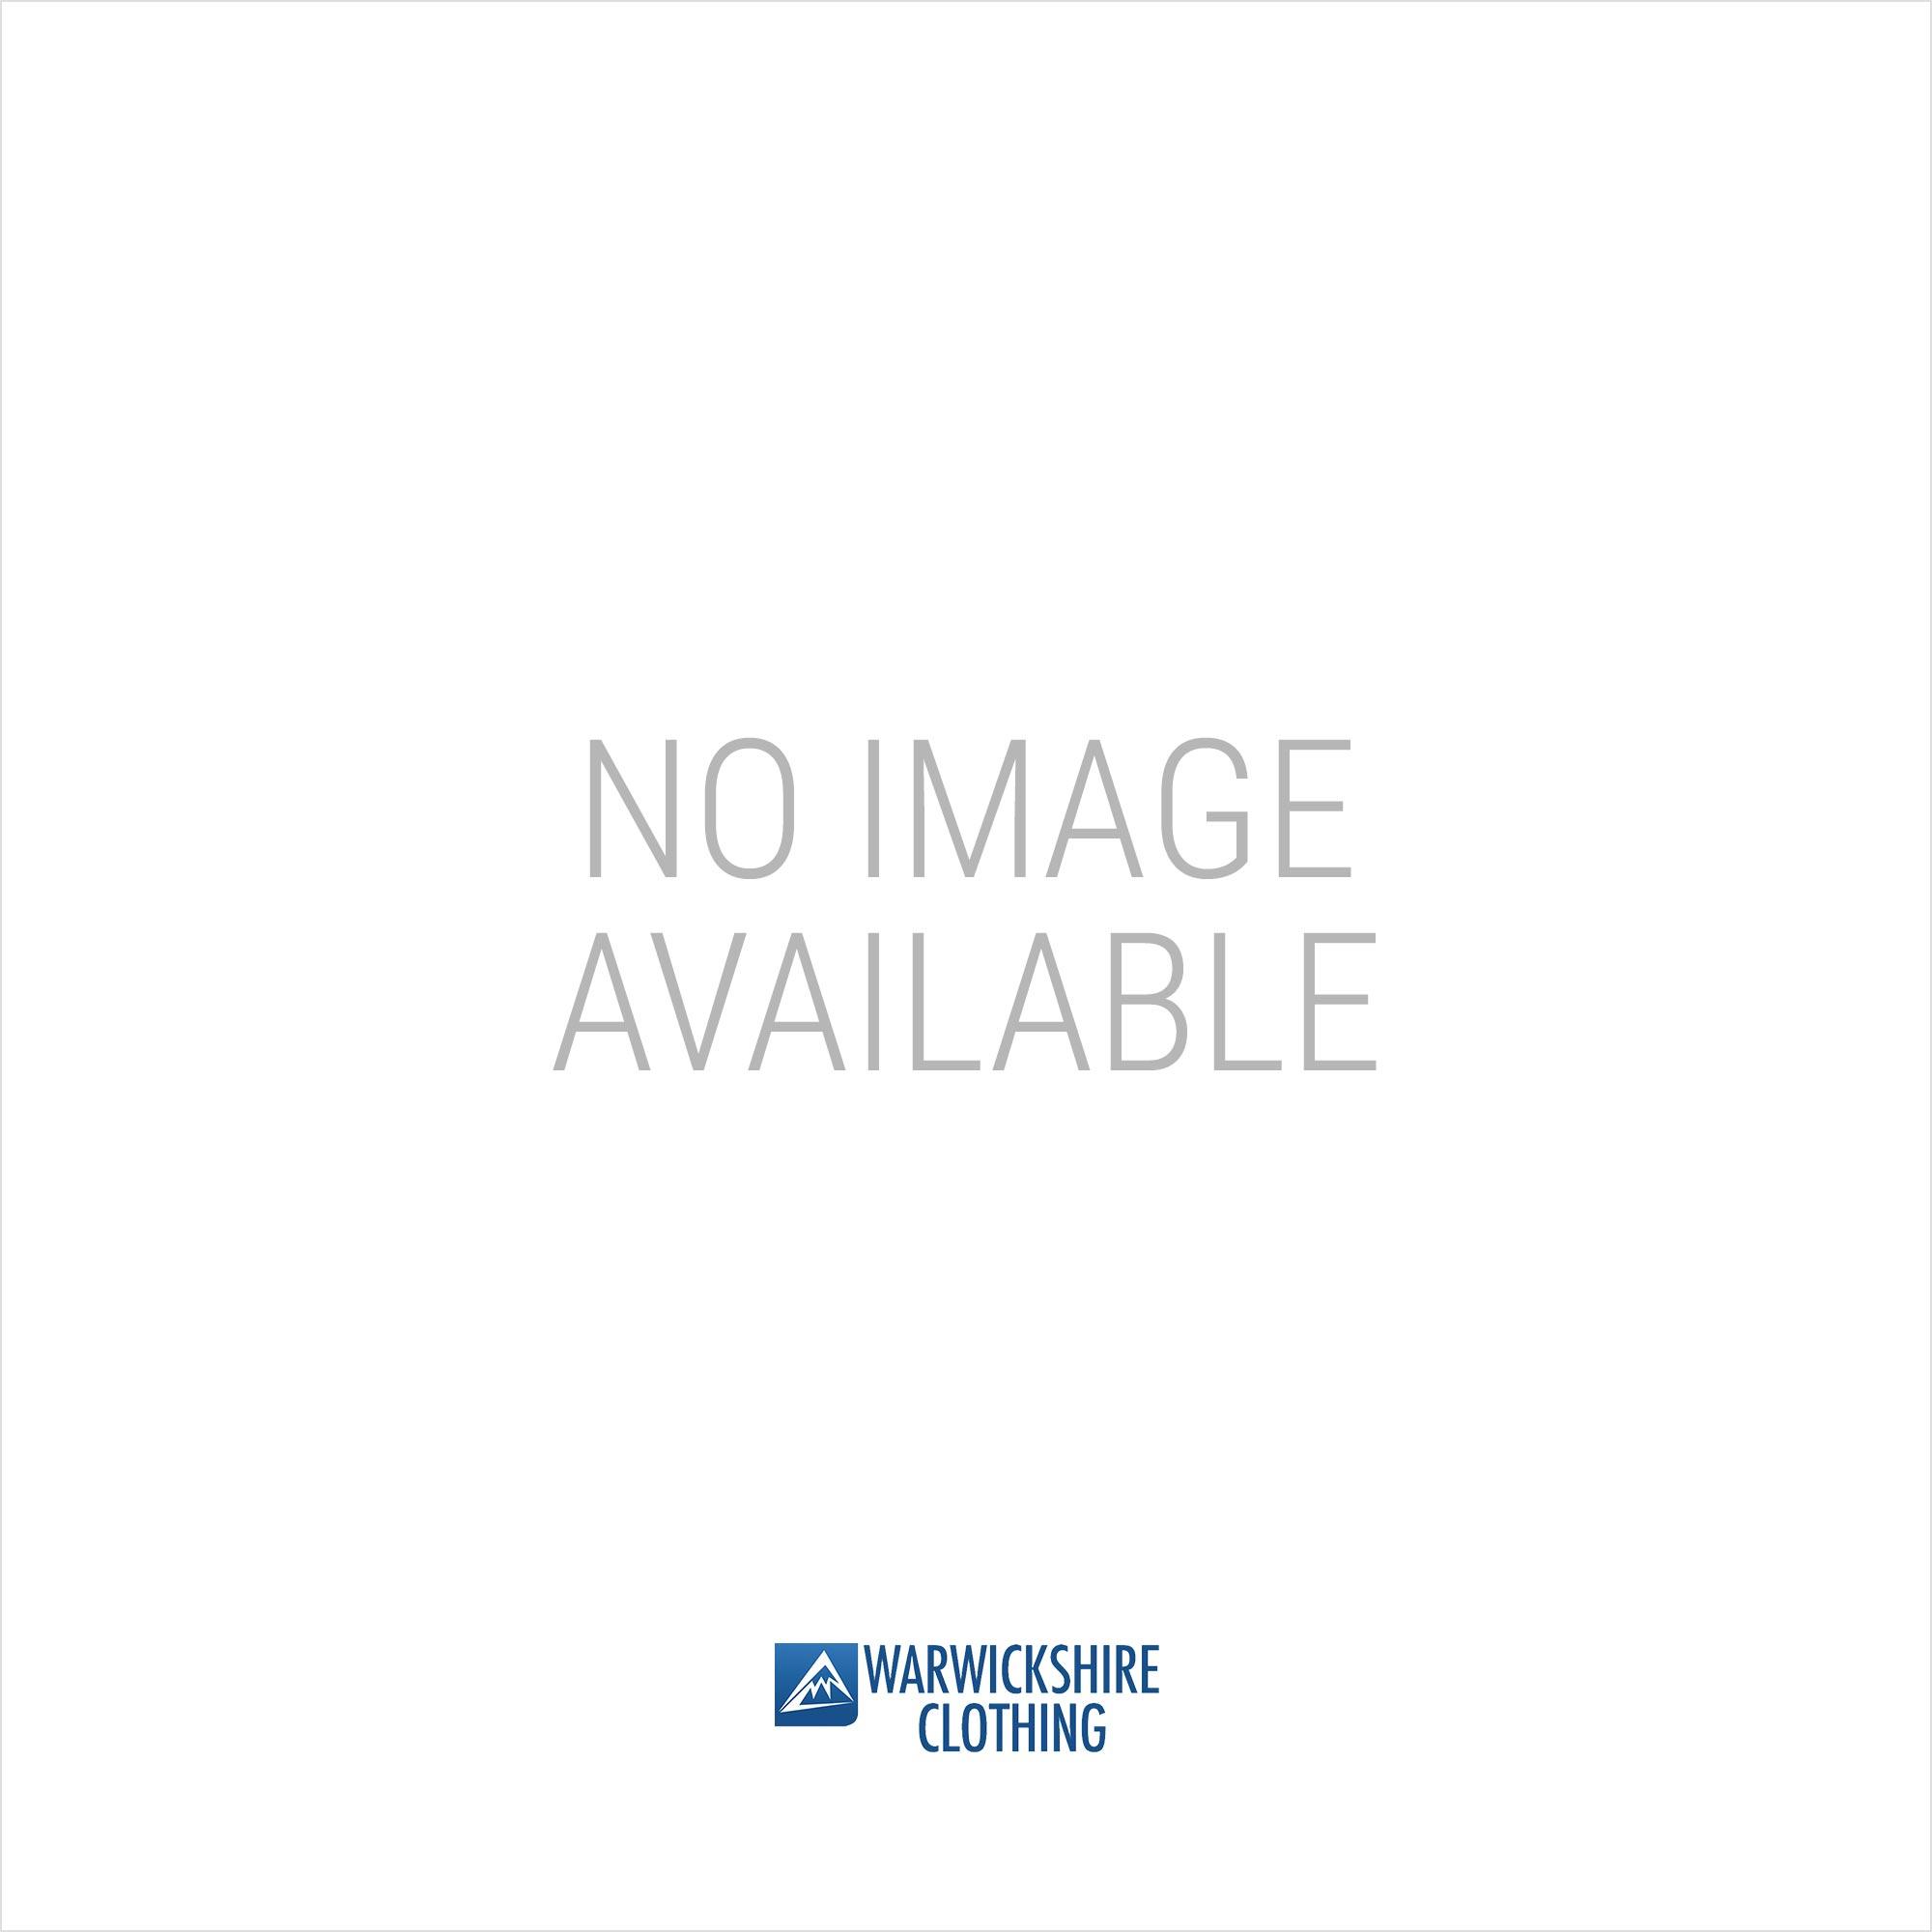 9936b97c3 Outdoor Clothing For Men & Women | Warwickshire Clothing